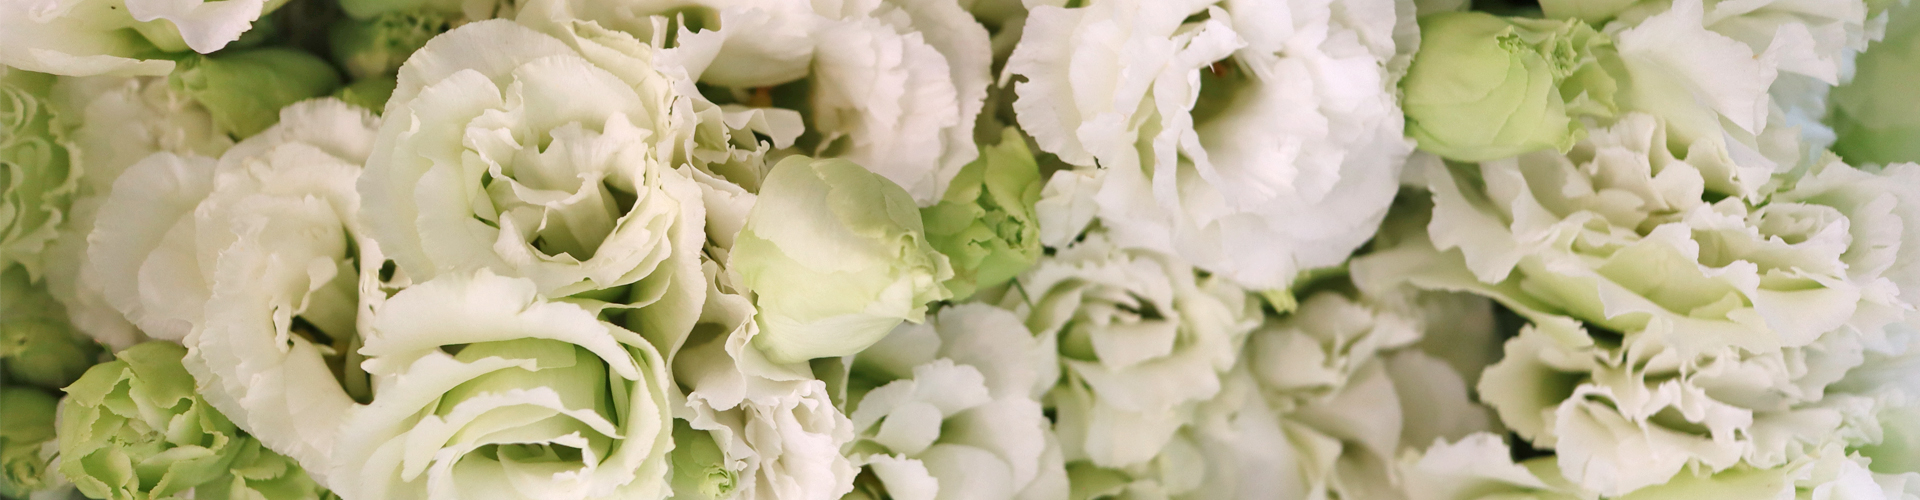 "<h1 style=""font-weight: 600"">flower</h1><br><p style=""line-height: 1.5;"">계절과 트랜드에 맞게 구성한 꽃을<br>집에서 편하게 만나보세요.</p>"